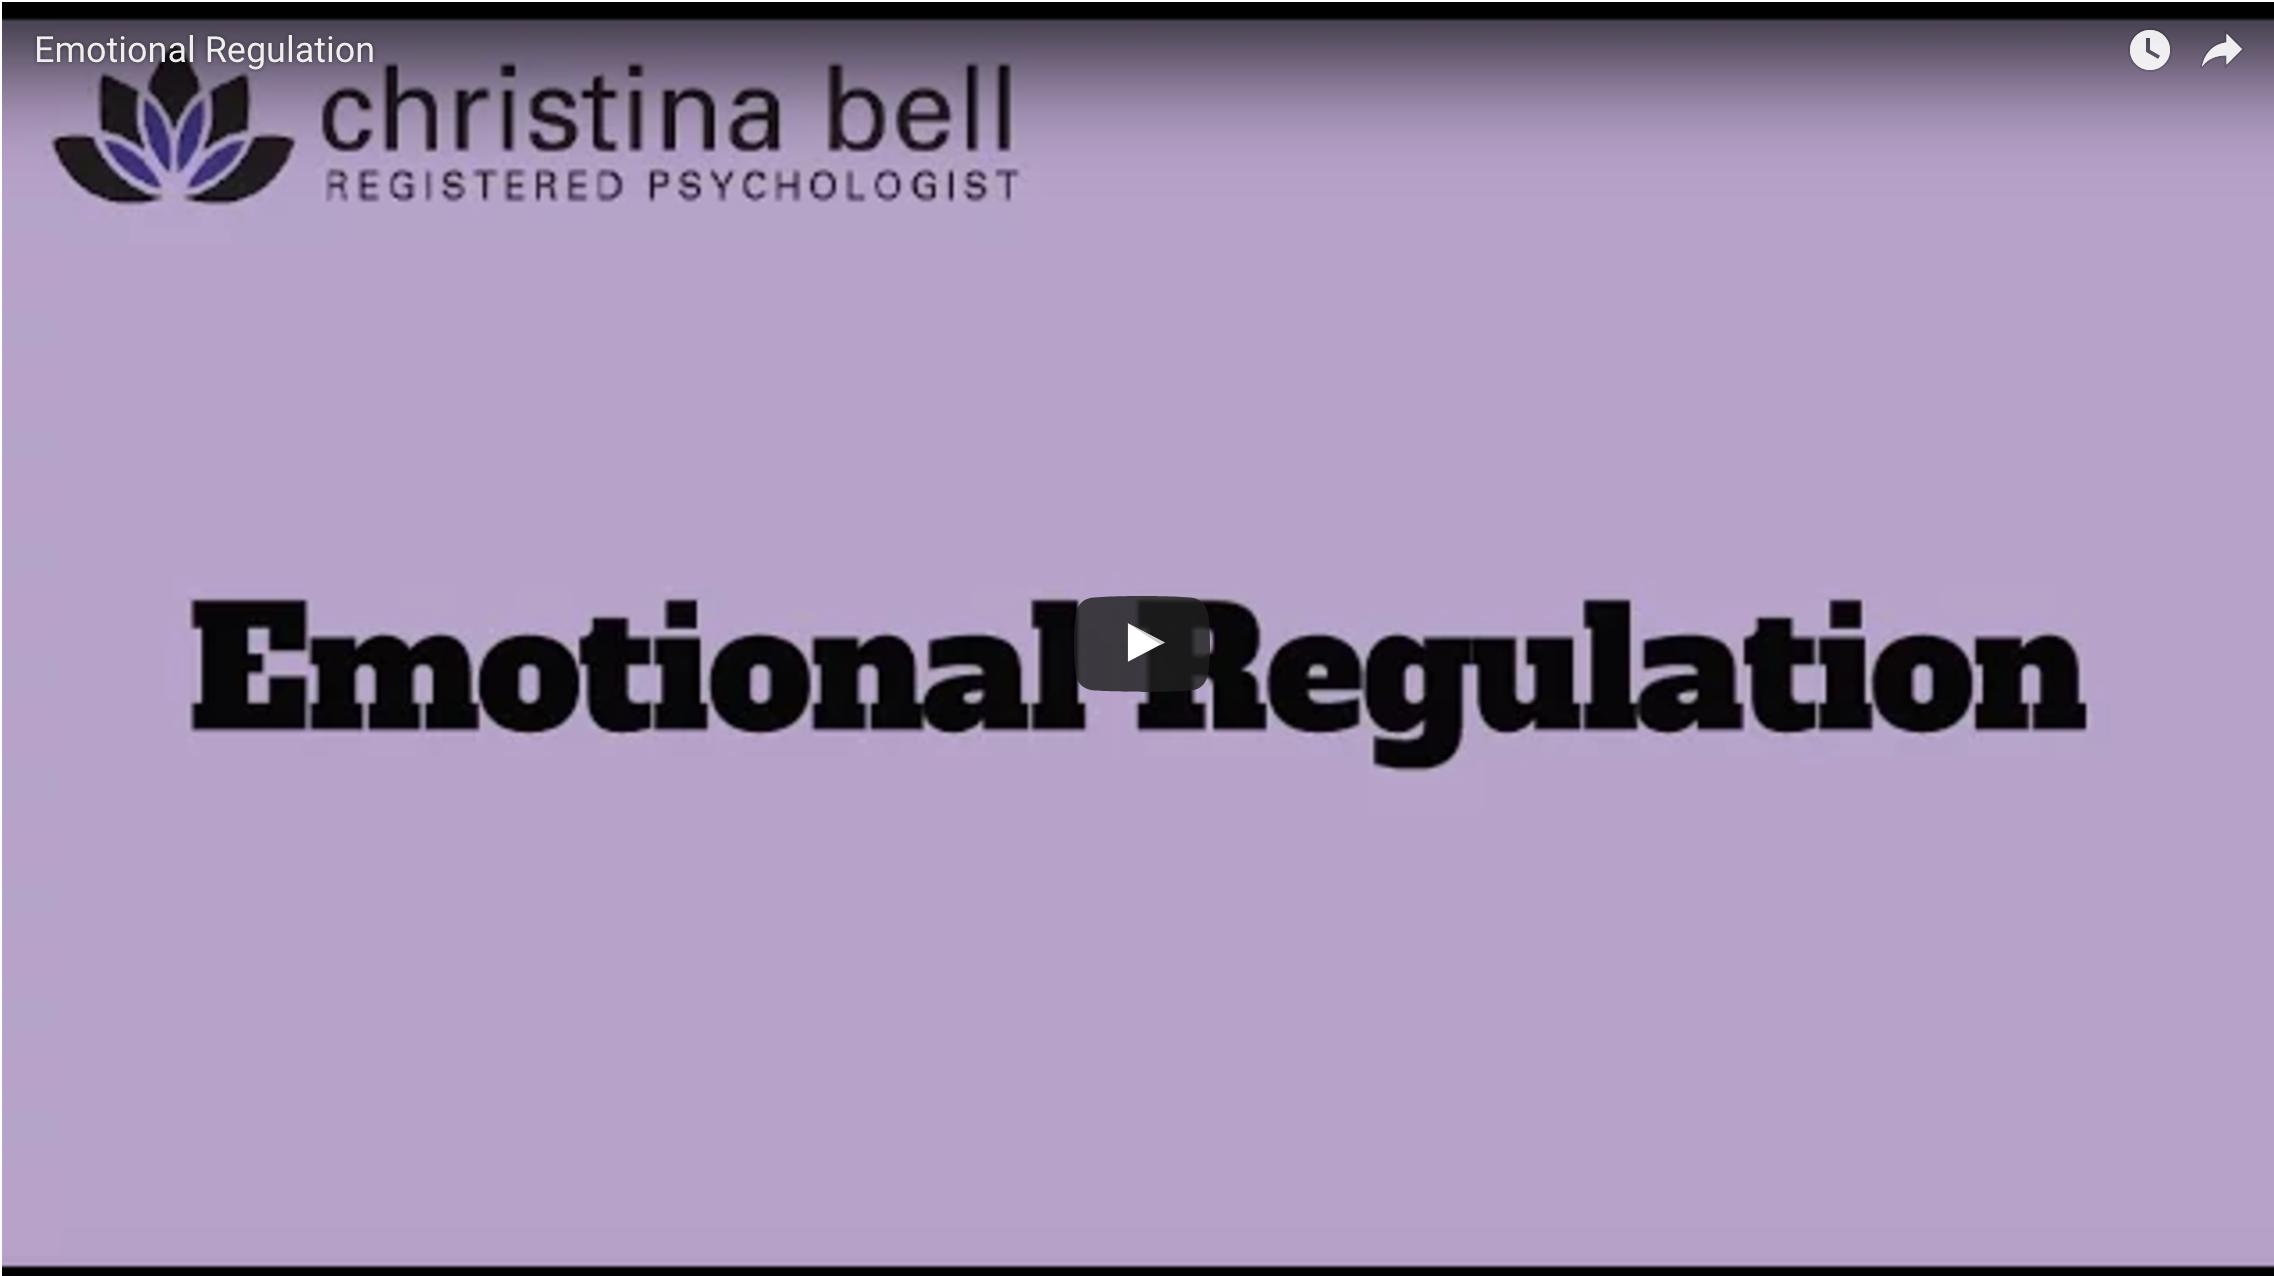 Christina bell - emotional regulation video